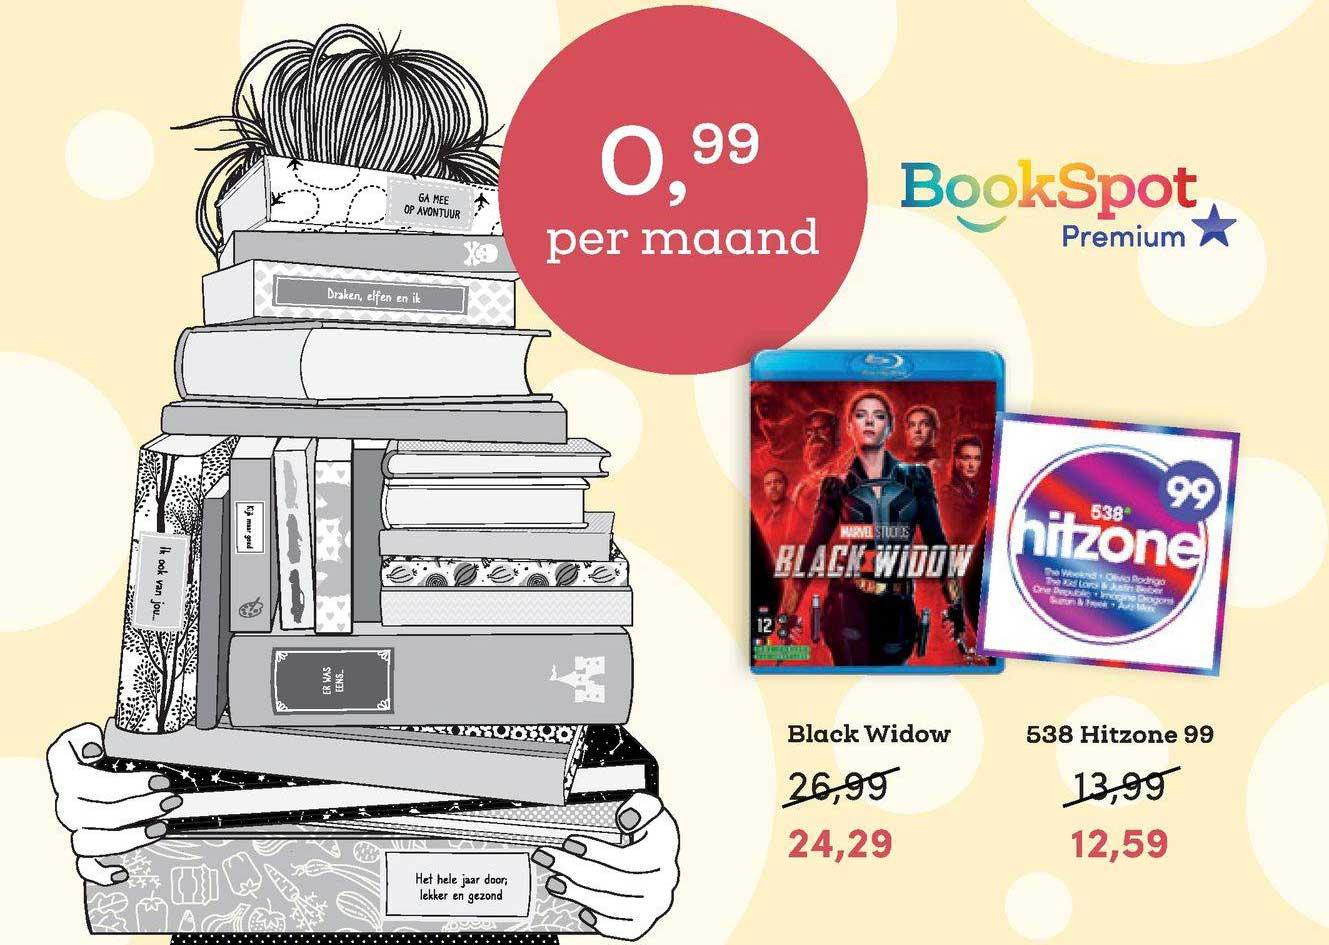 BookSpot Black Widow Of 538 Hitzone 99